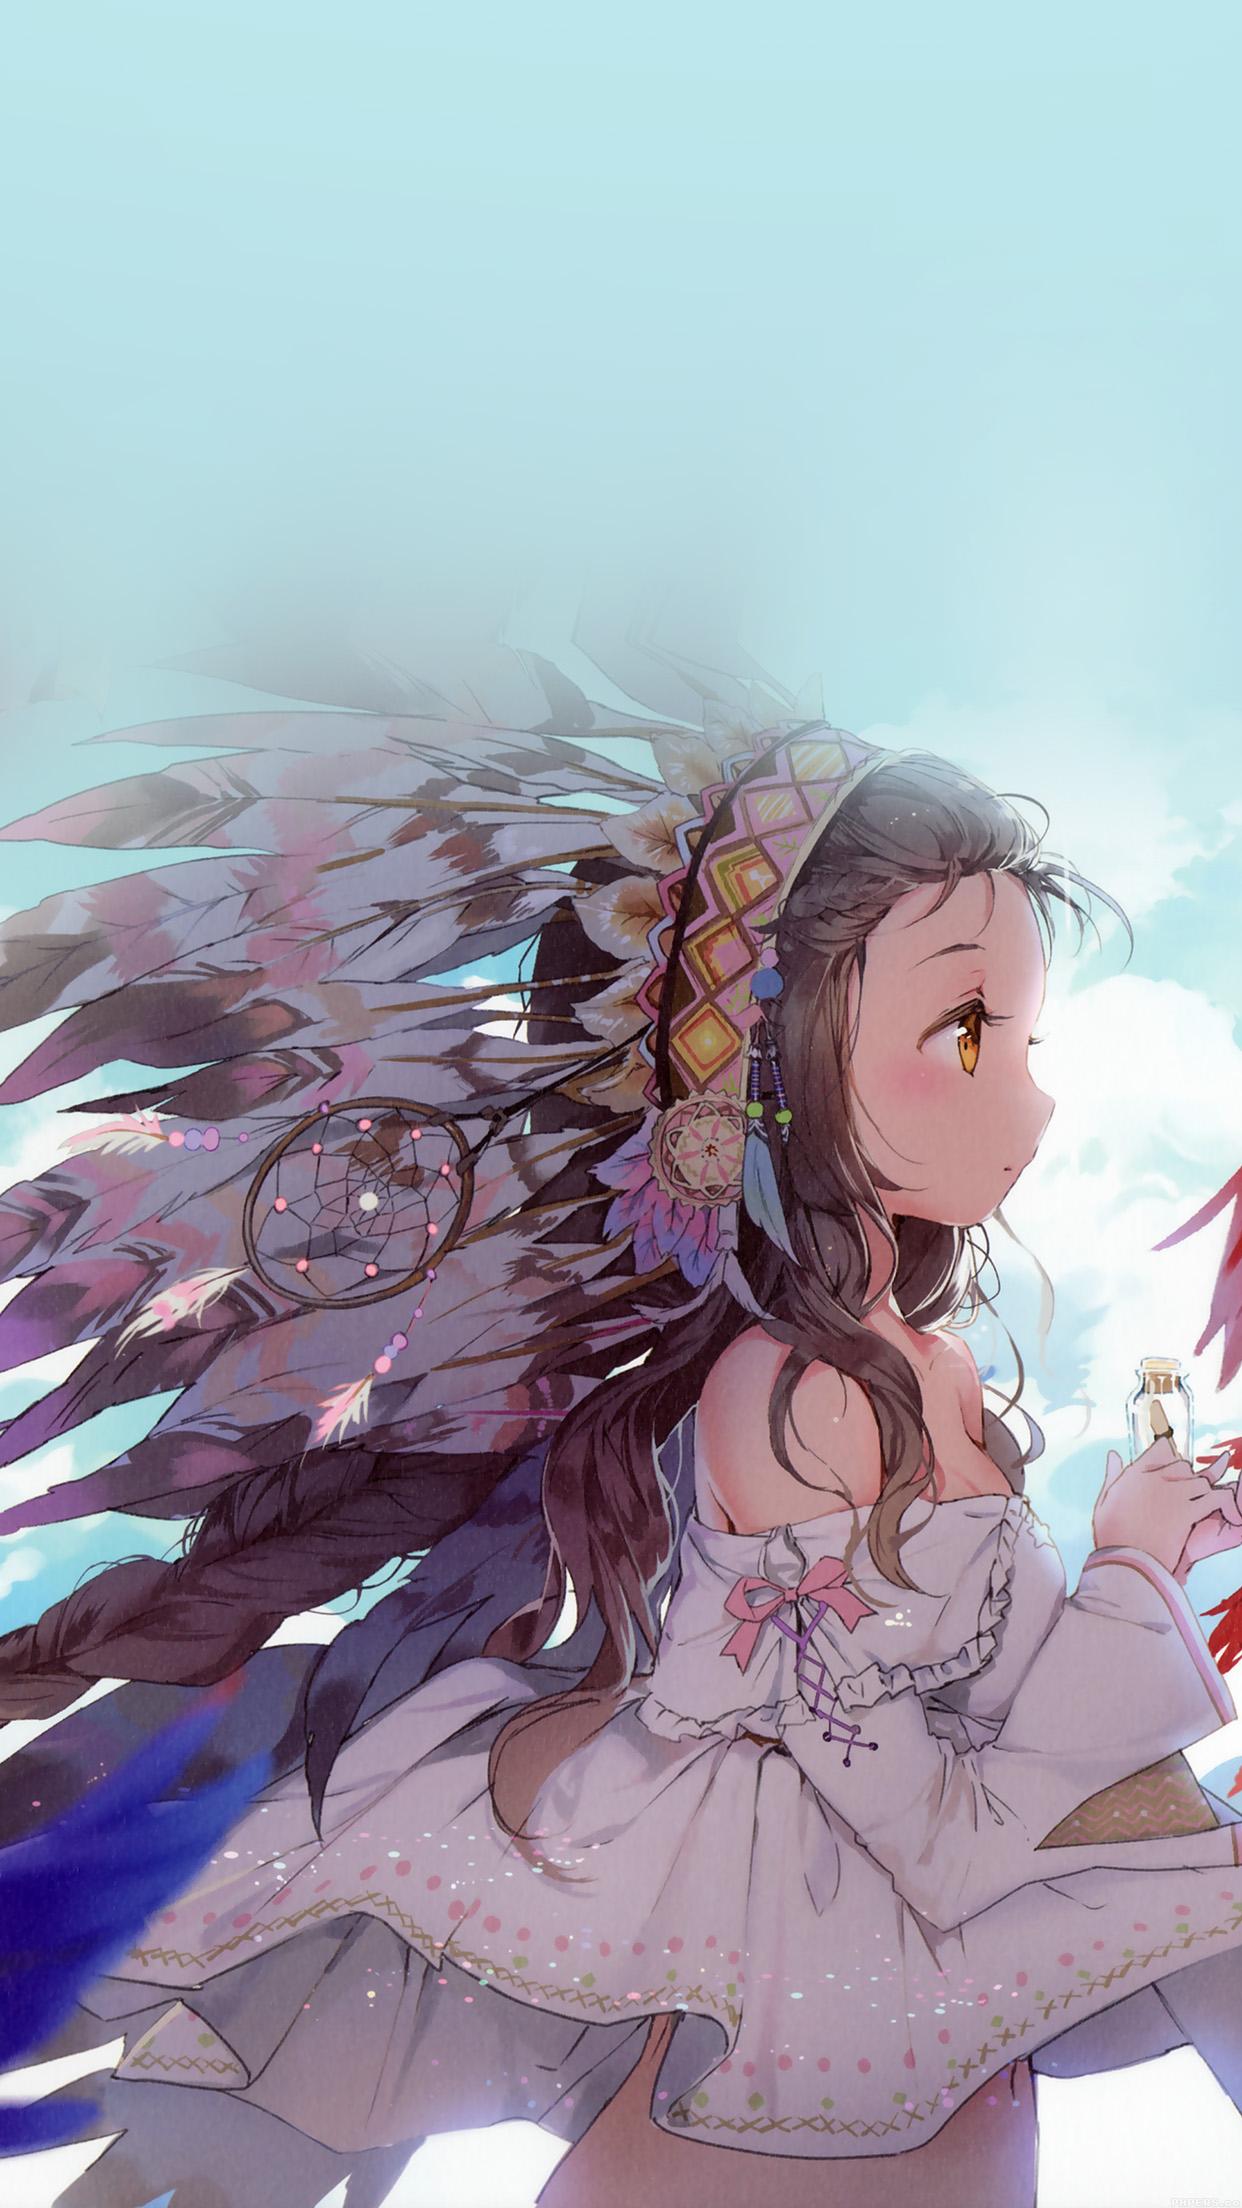 Indian Girl Anime Birds Illust Art Android Wallpaper - Indian Girl Anime , HD Wallpaper & Backgrounds